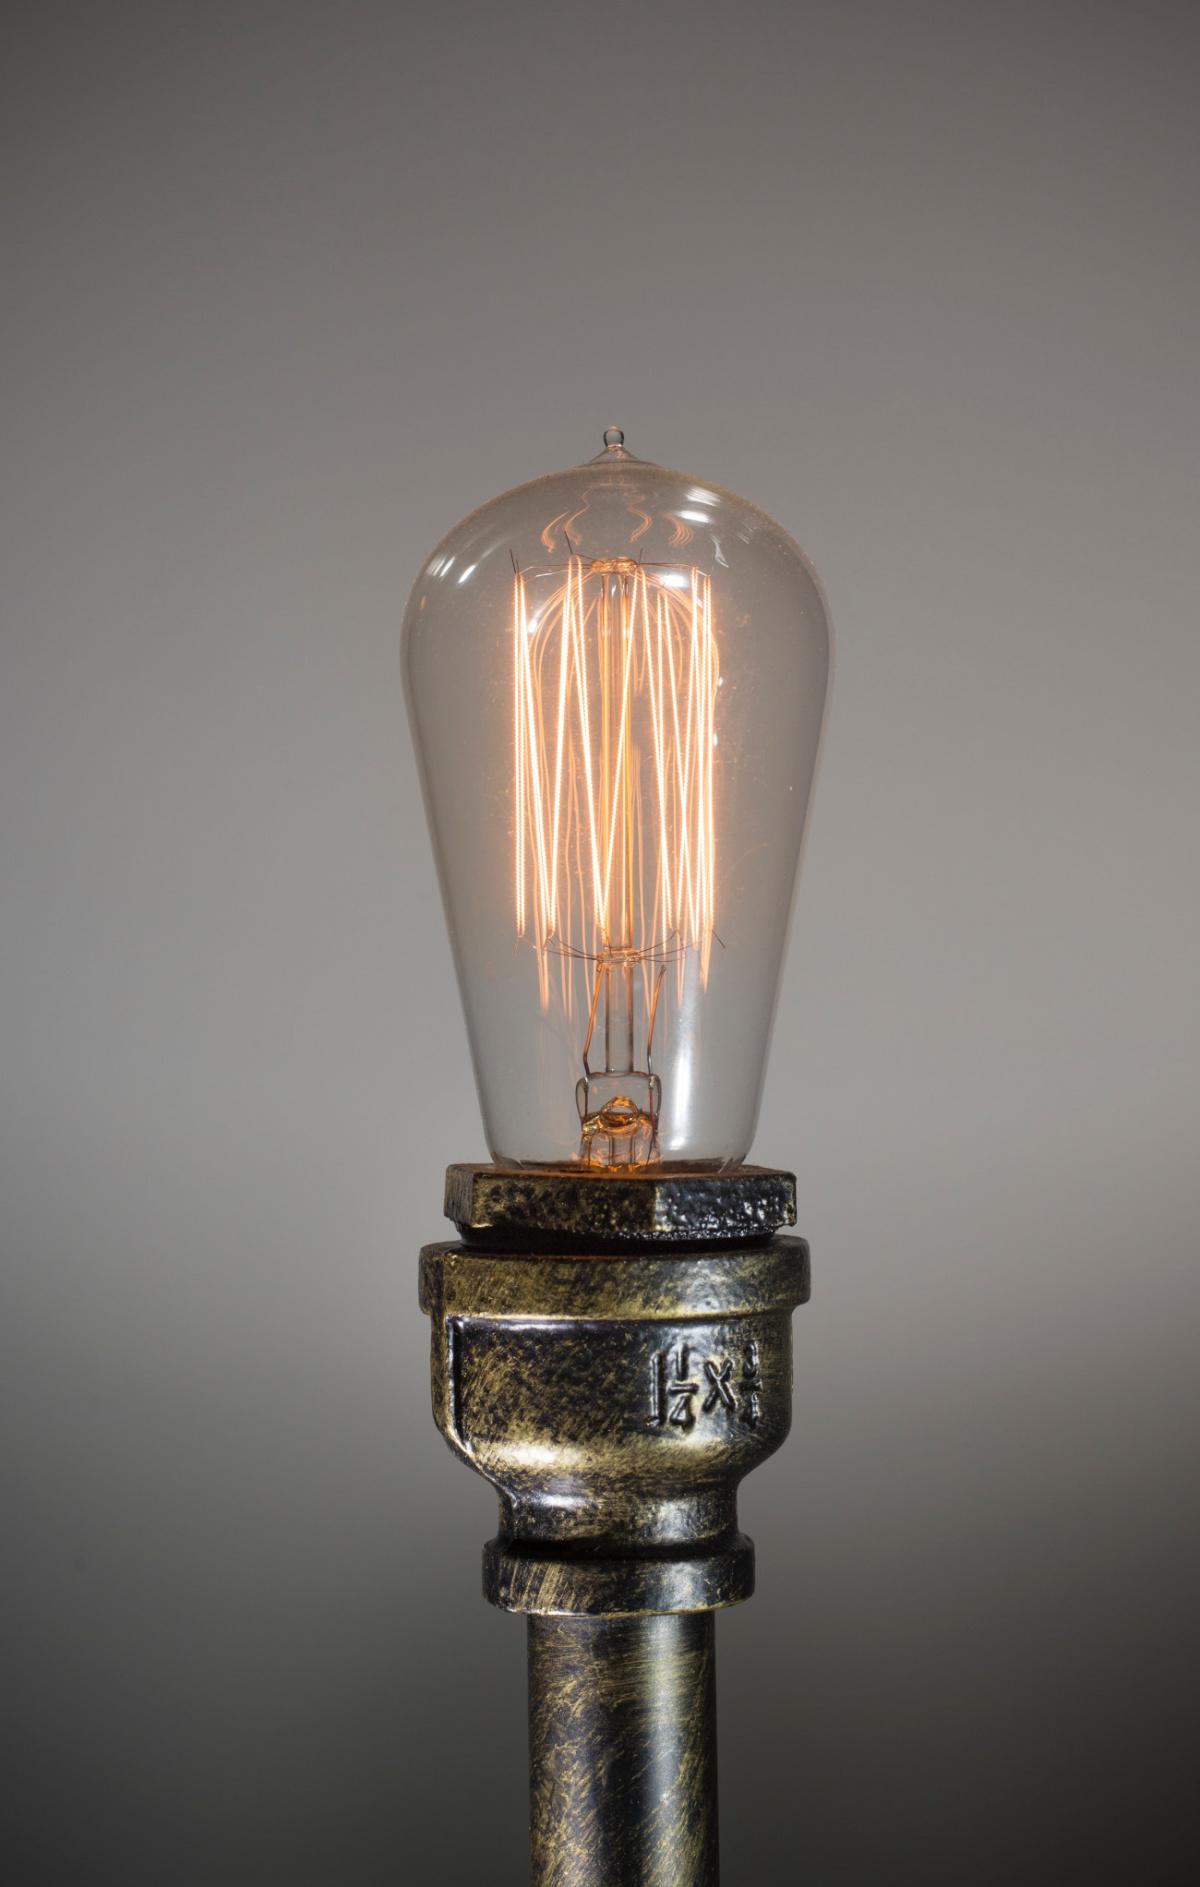 An edison lightbulb on a pipe lamp